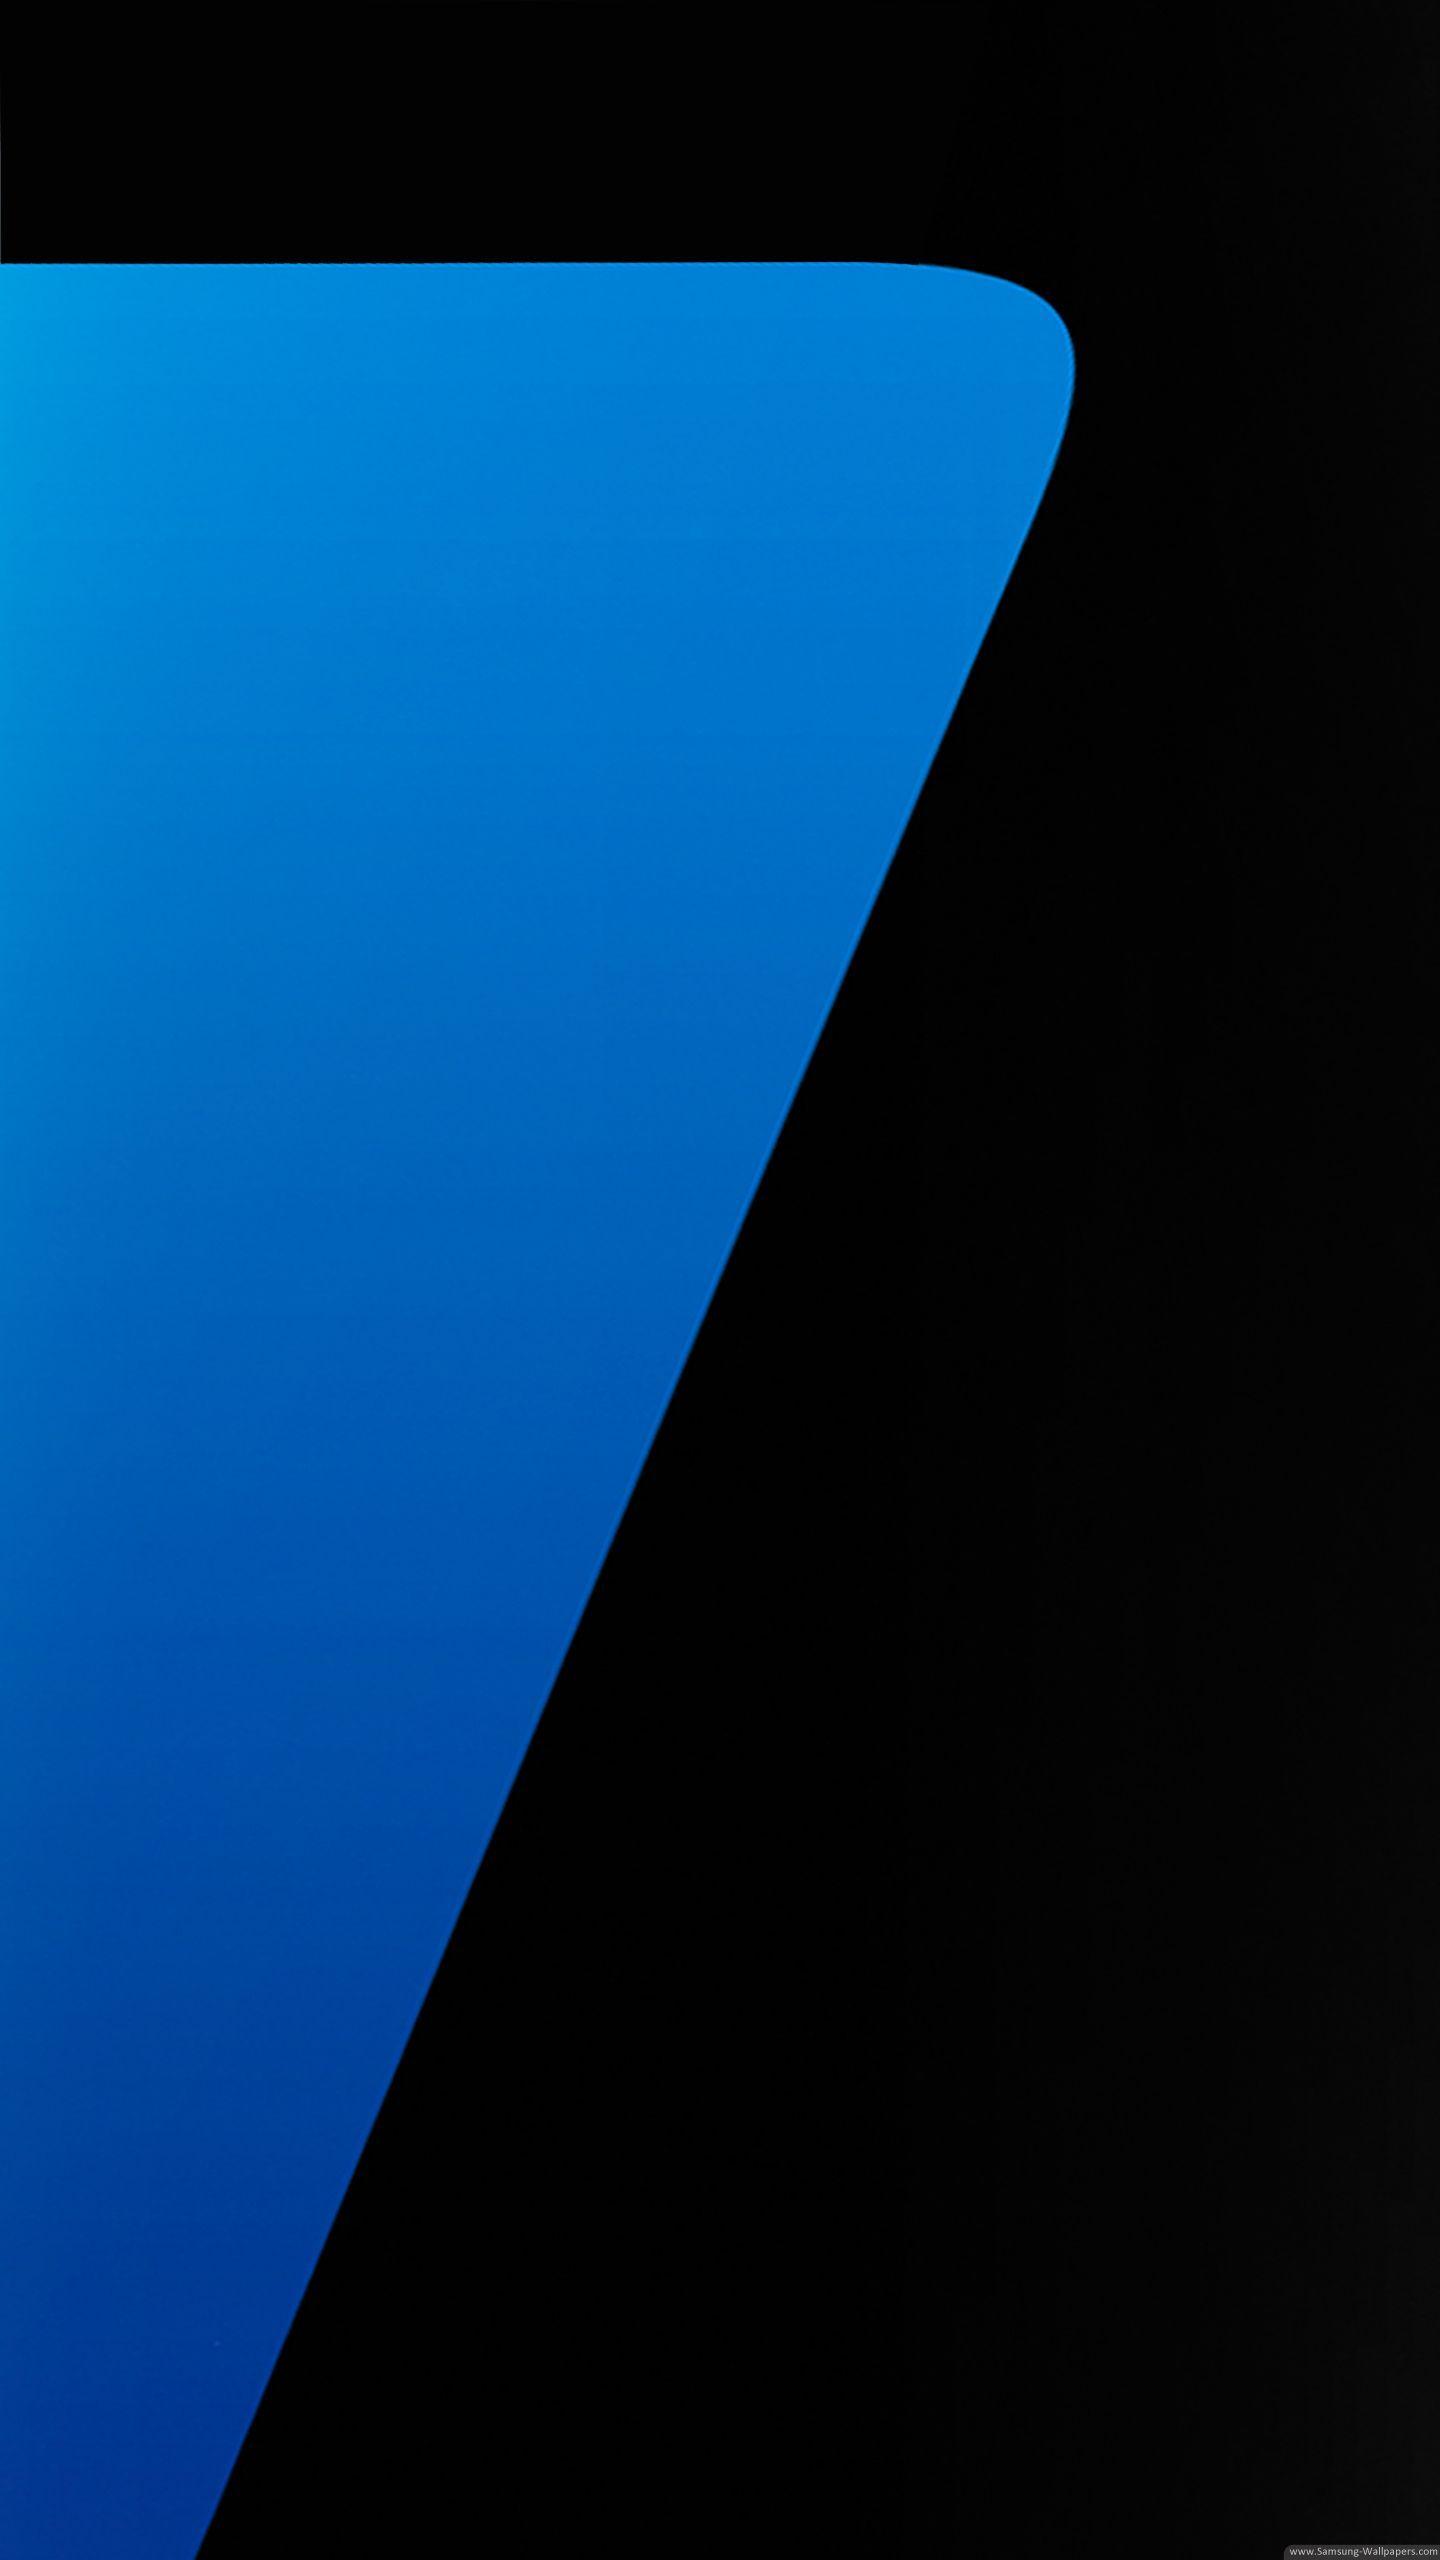 Samsung Galaxy S7 Wallpapers   Top Samsung Galaxy S7 1440x2560